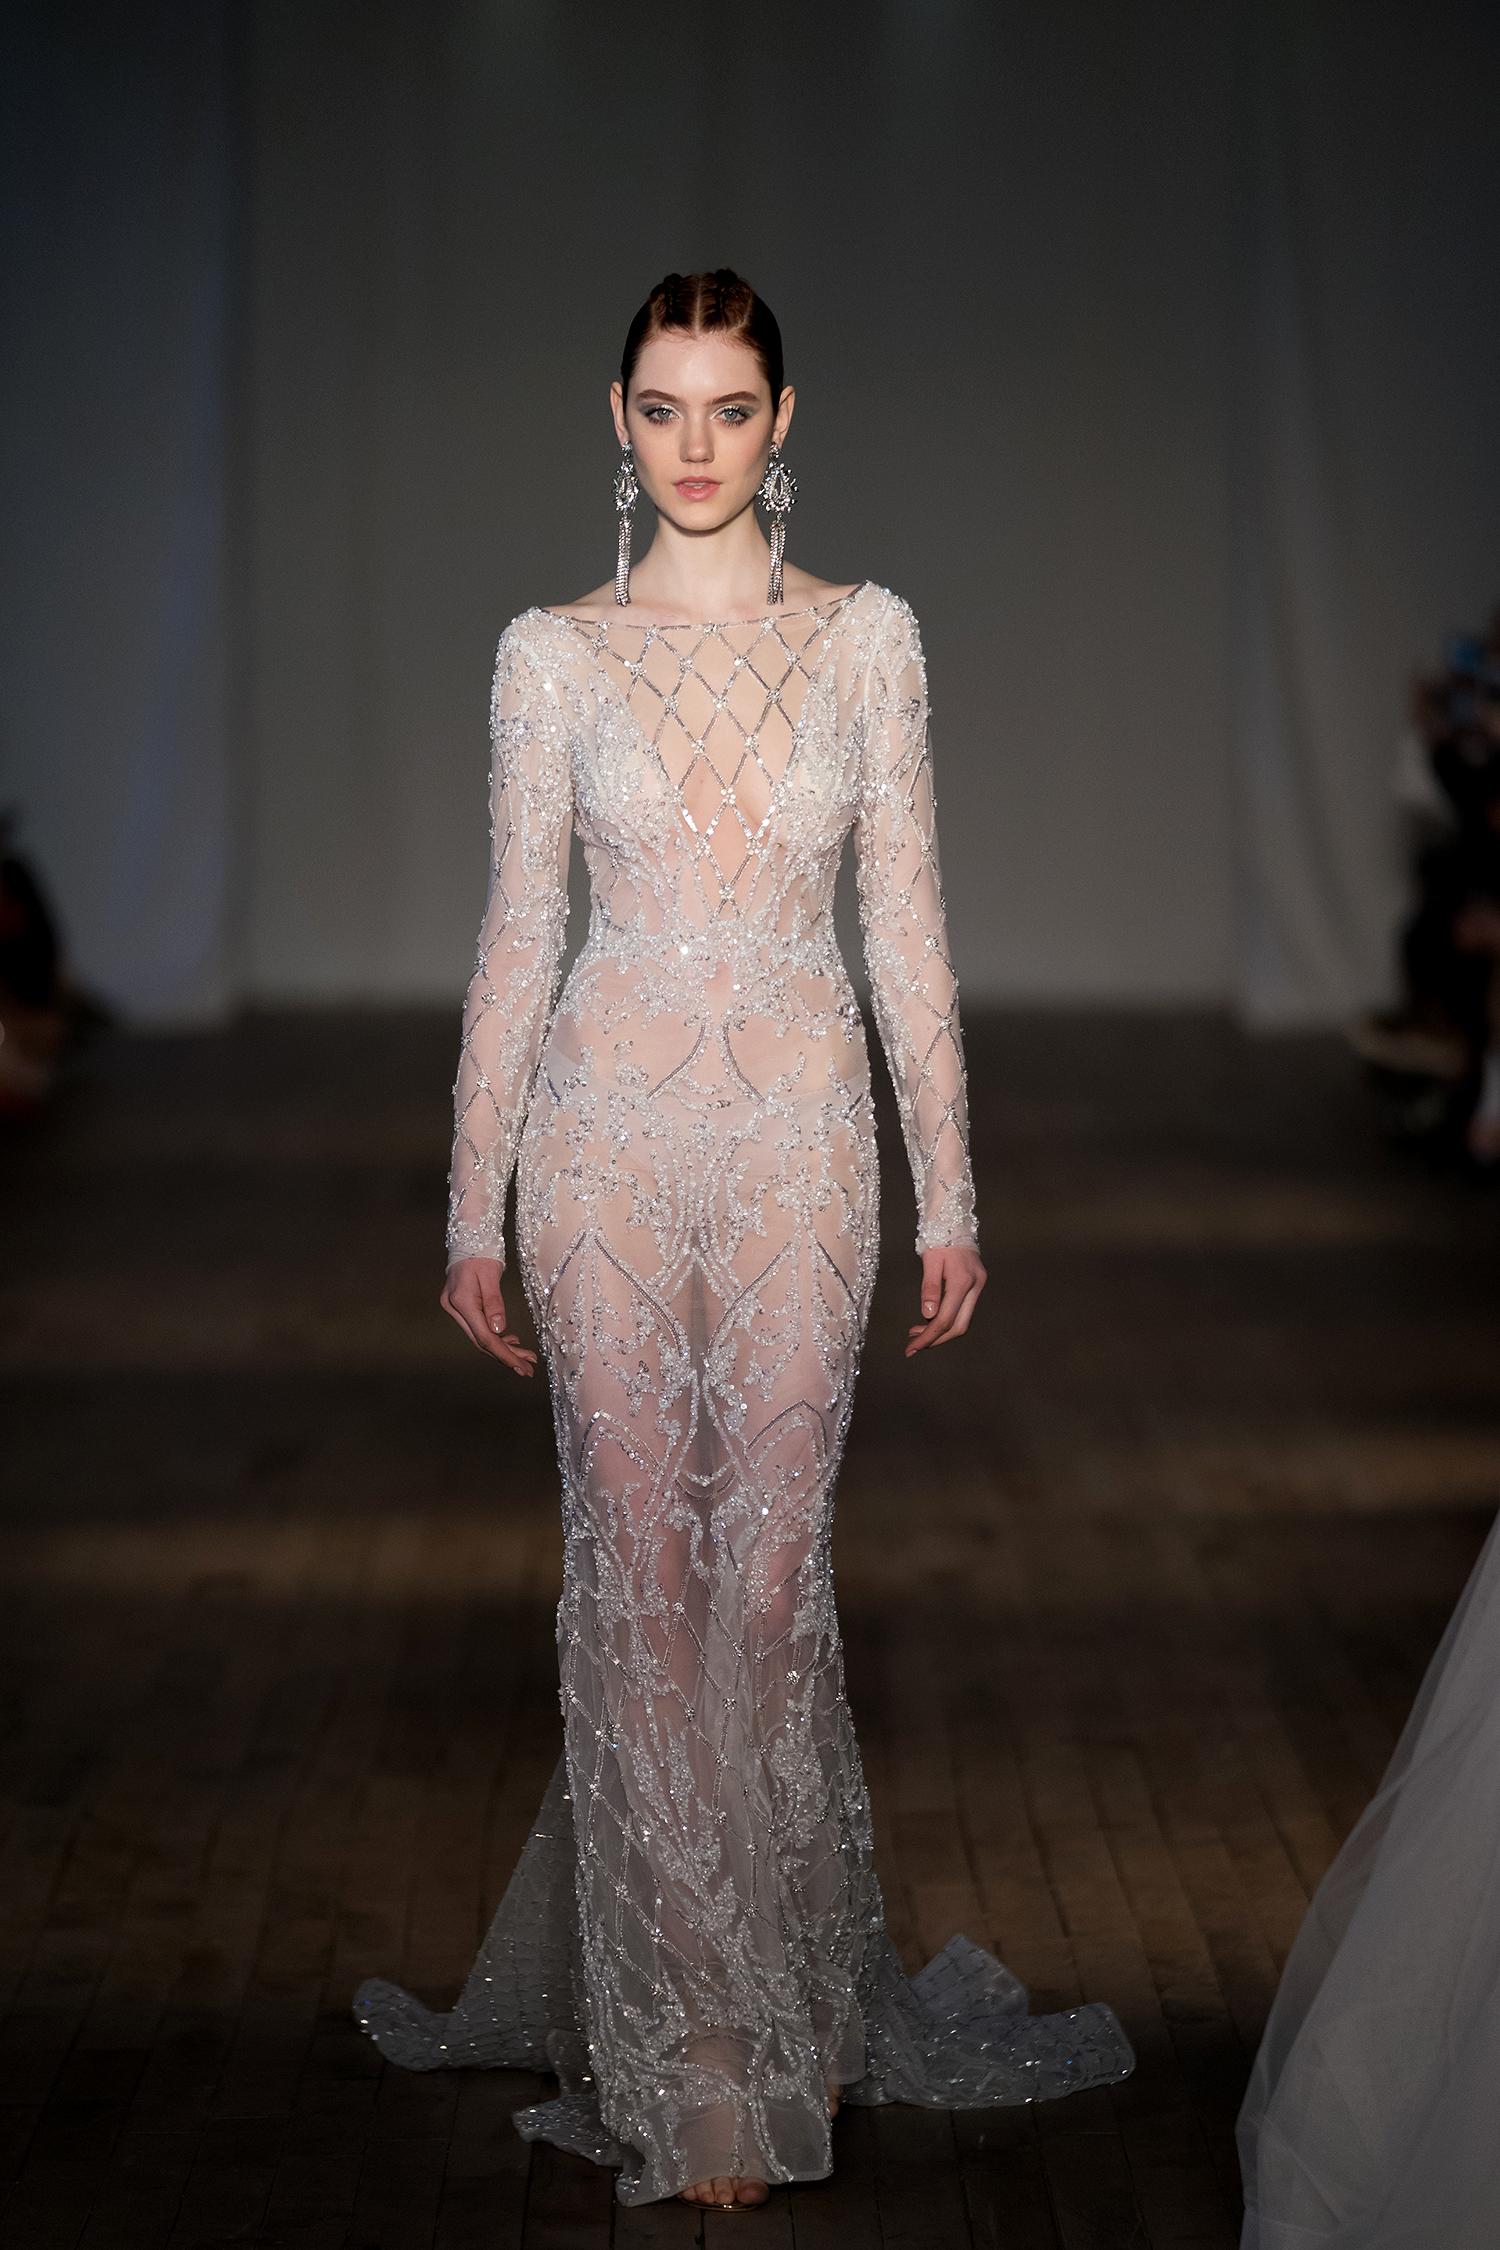 berta wedding dress spring 2019 sheer long-sleeved crystal details